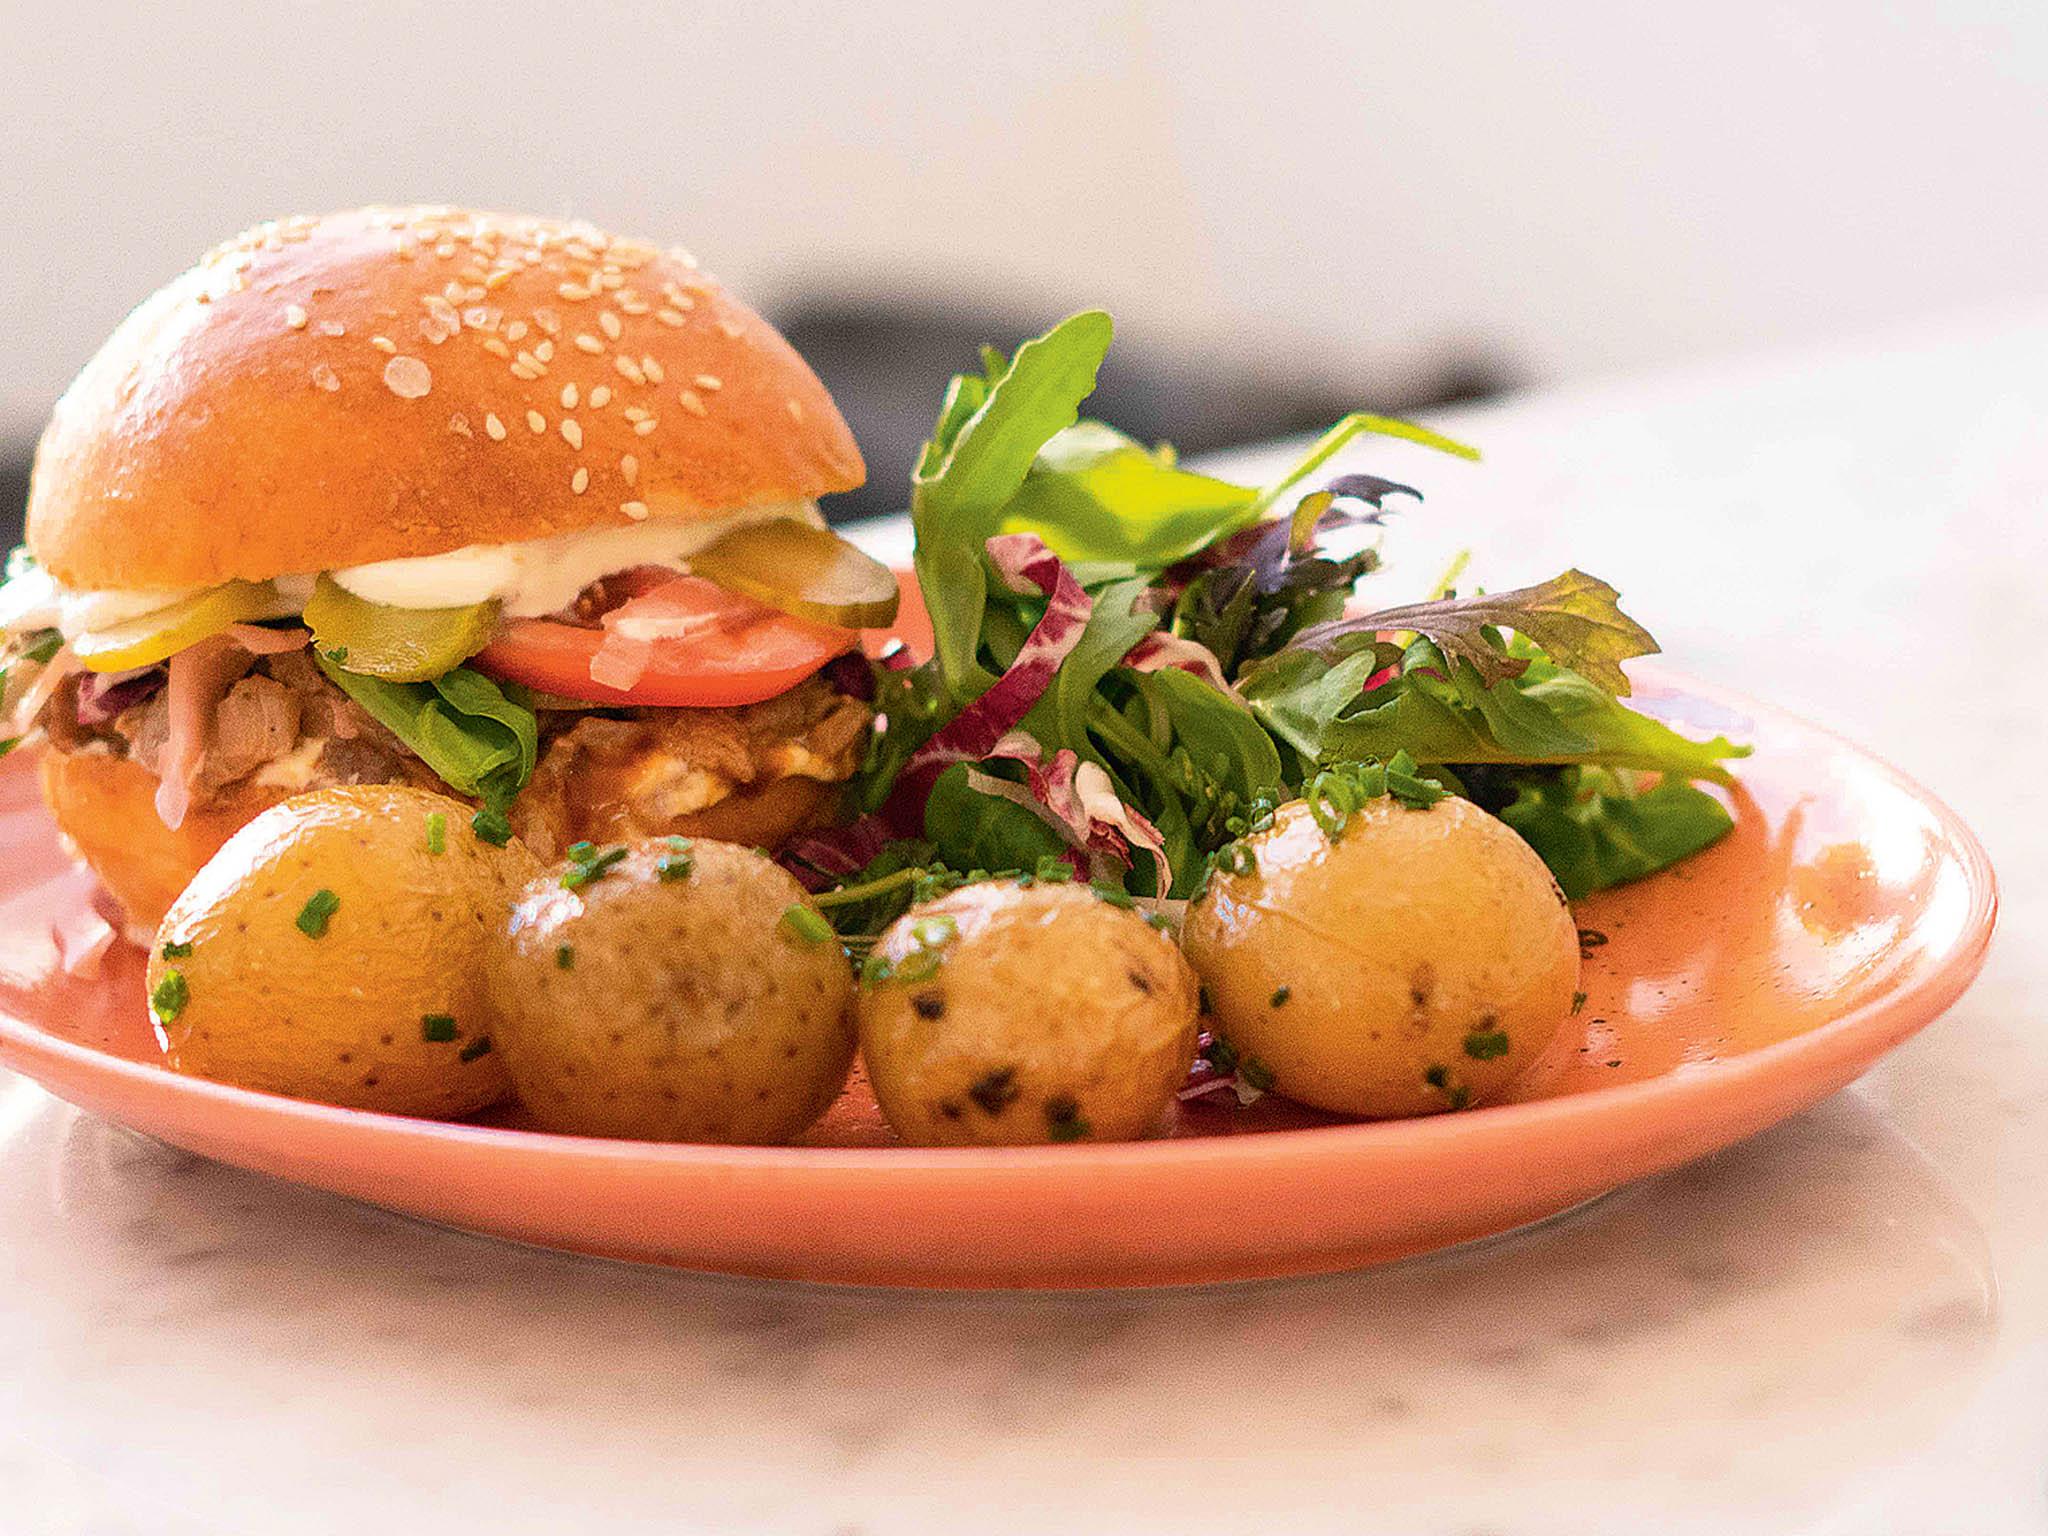 Bohemian burger s trhaným kachním masem